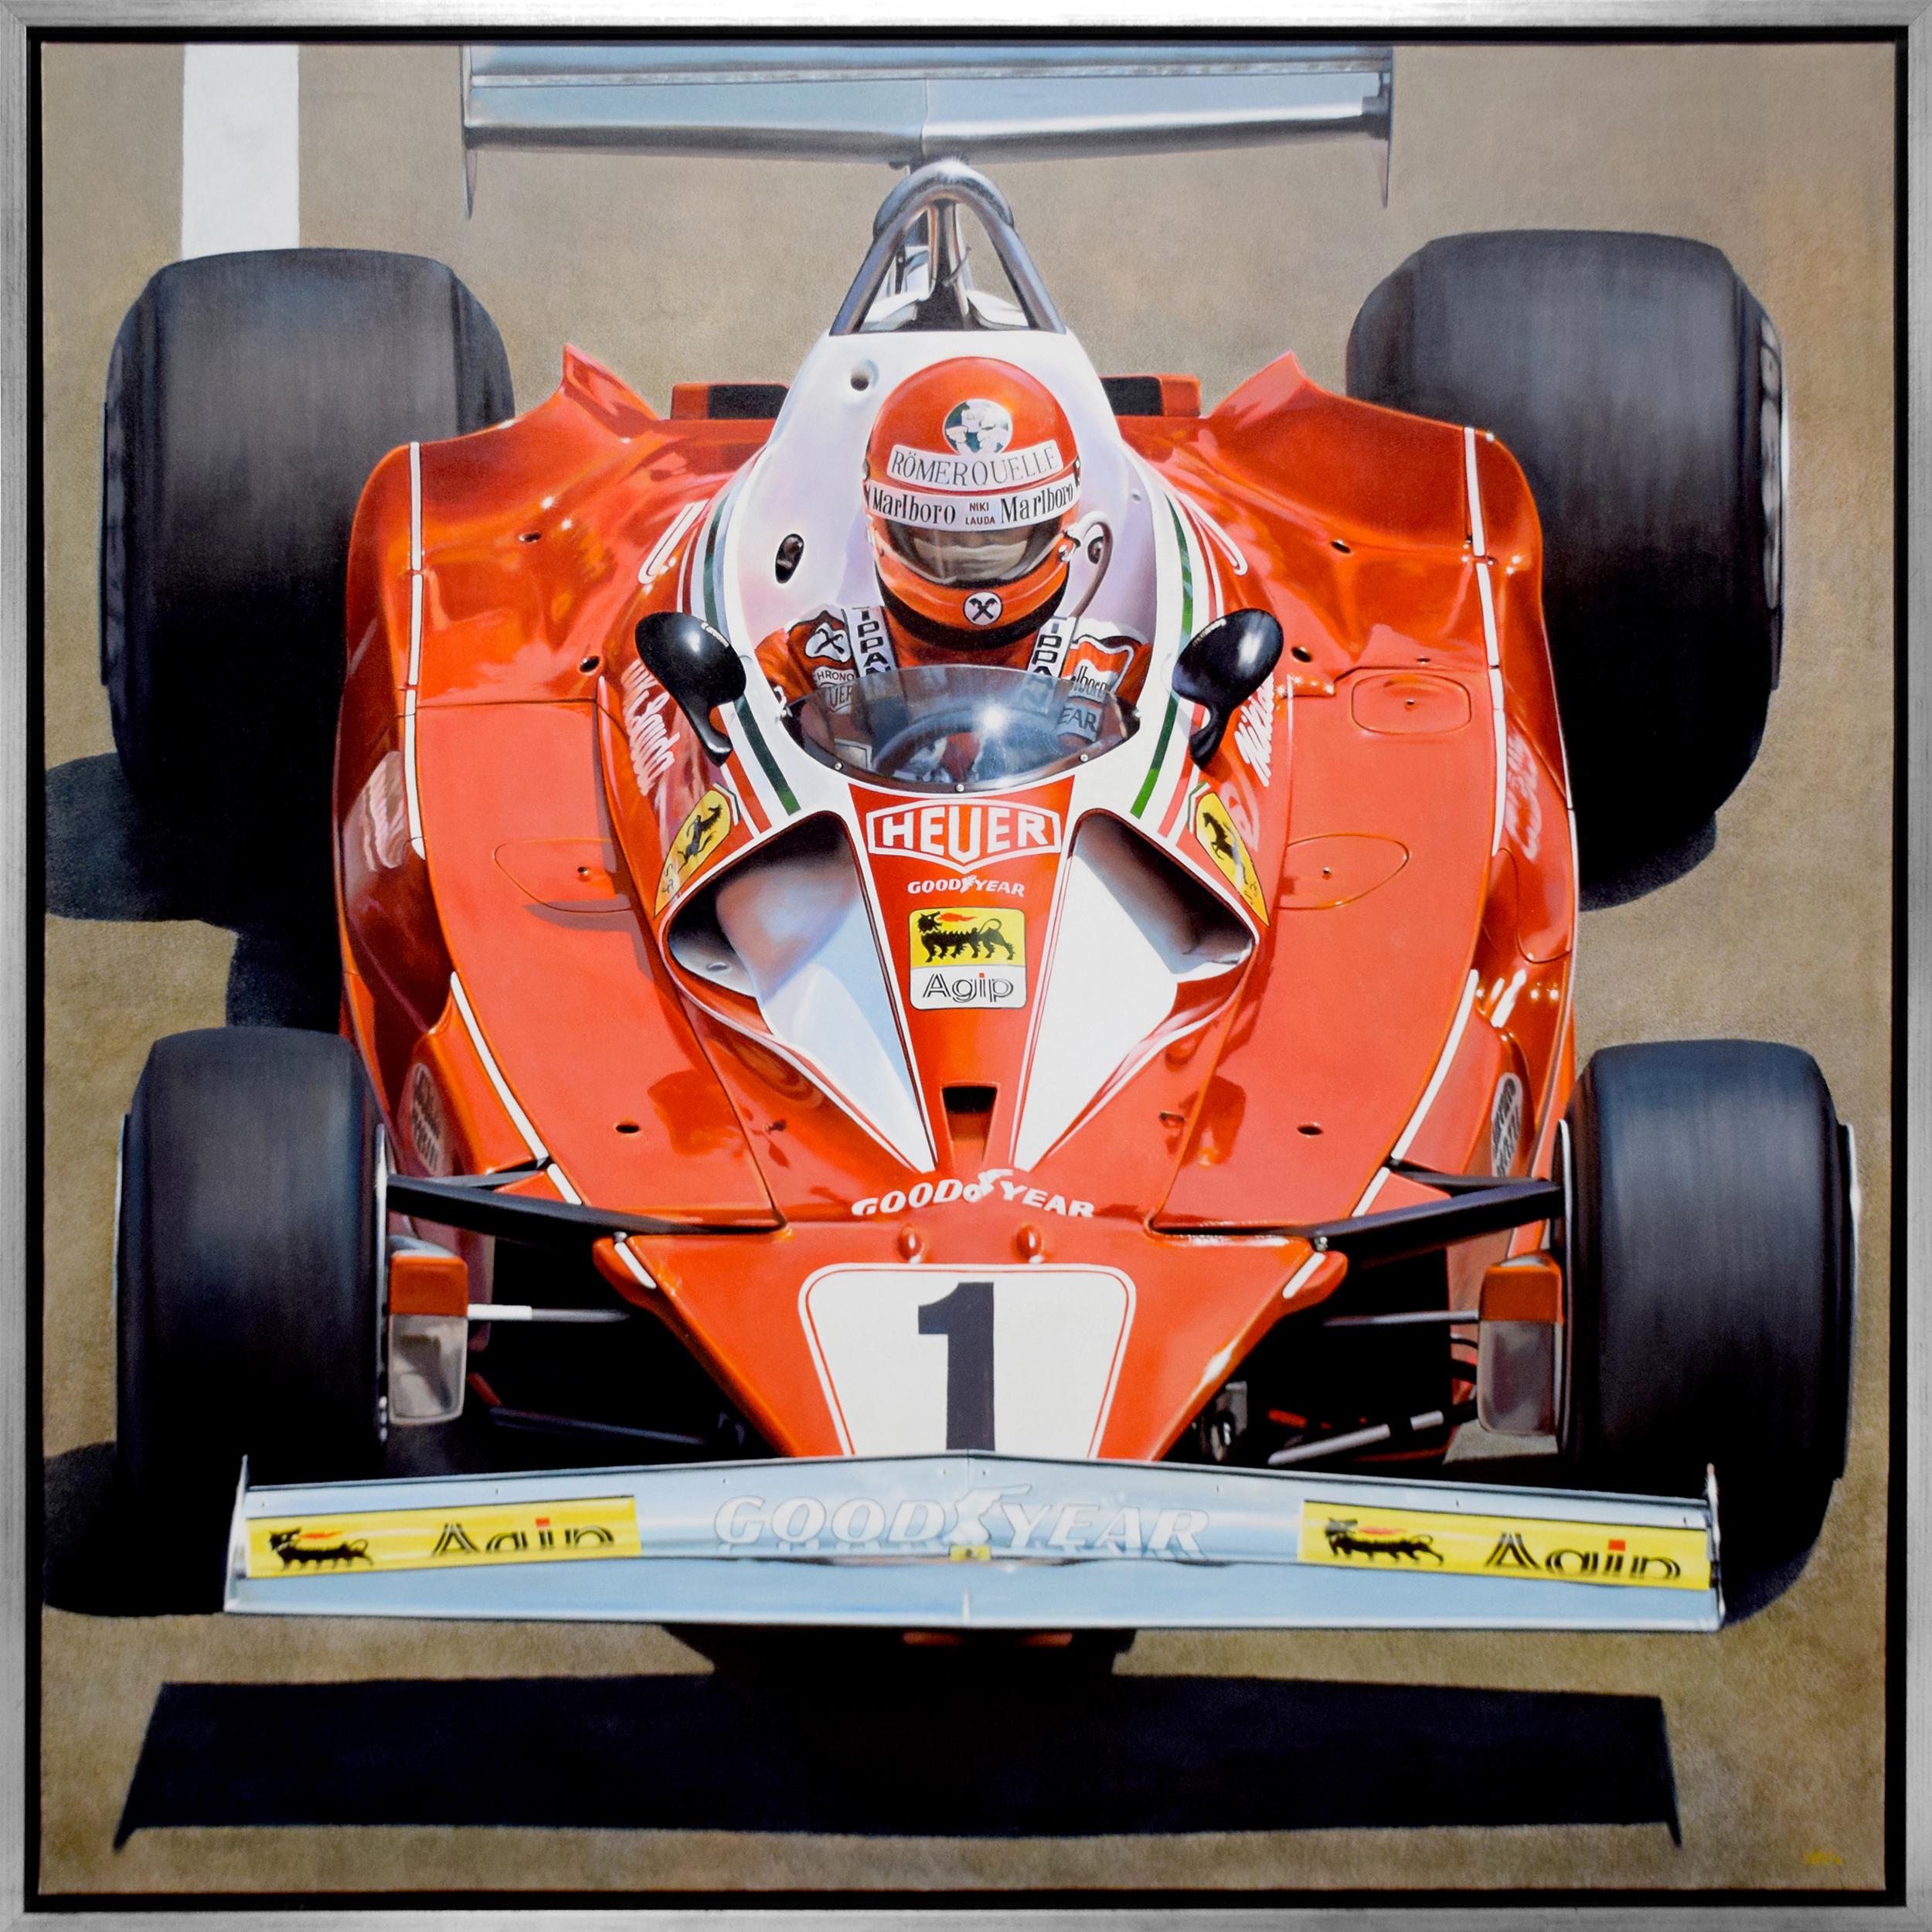 Luigi Rocca - Niki '76 , 6855-006-815